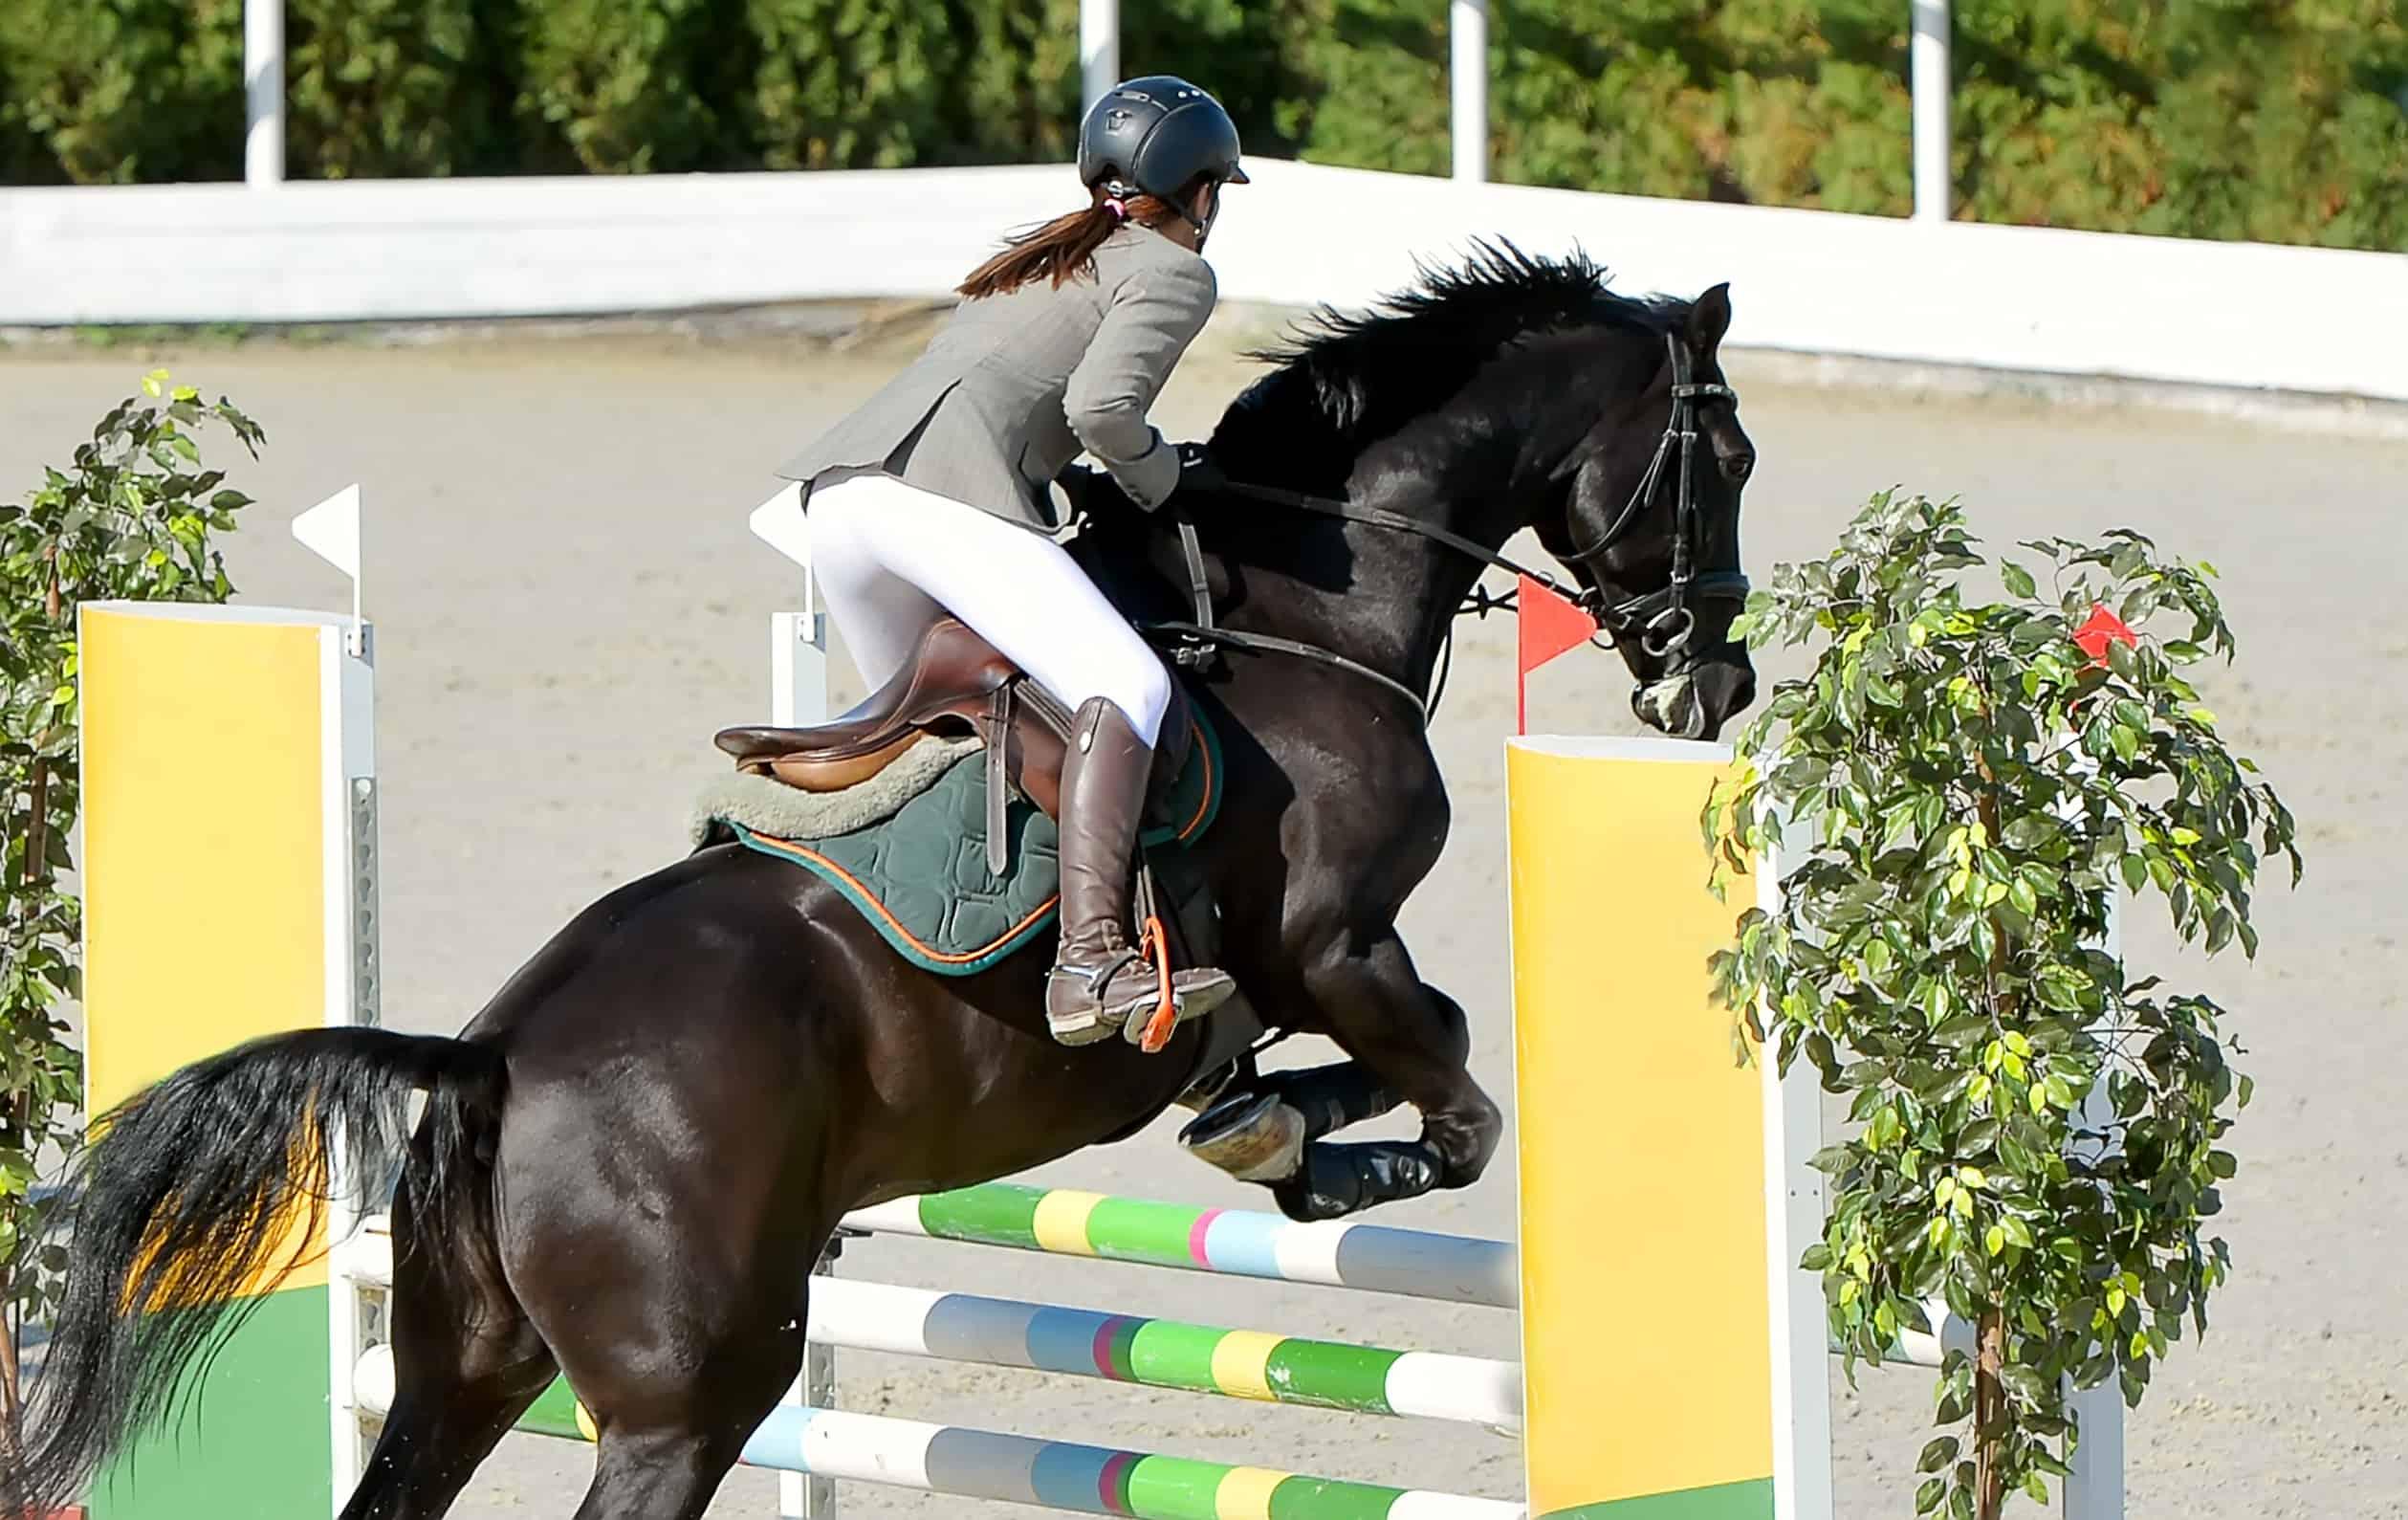 horseback riding cost